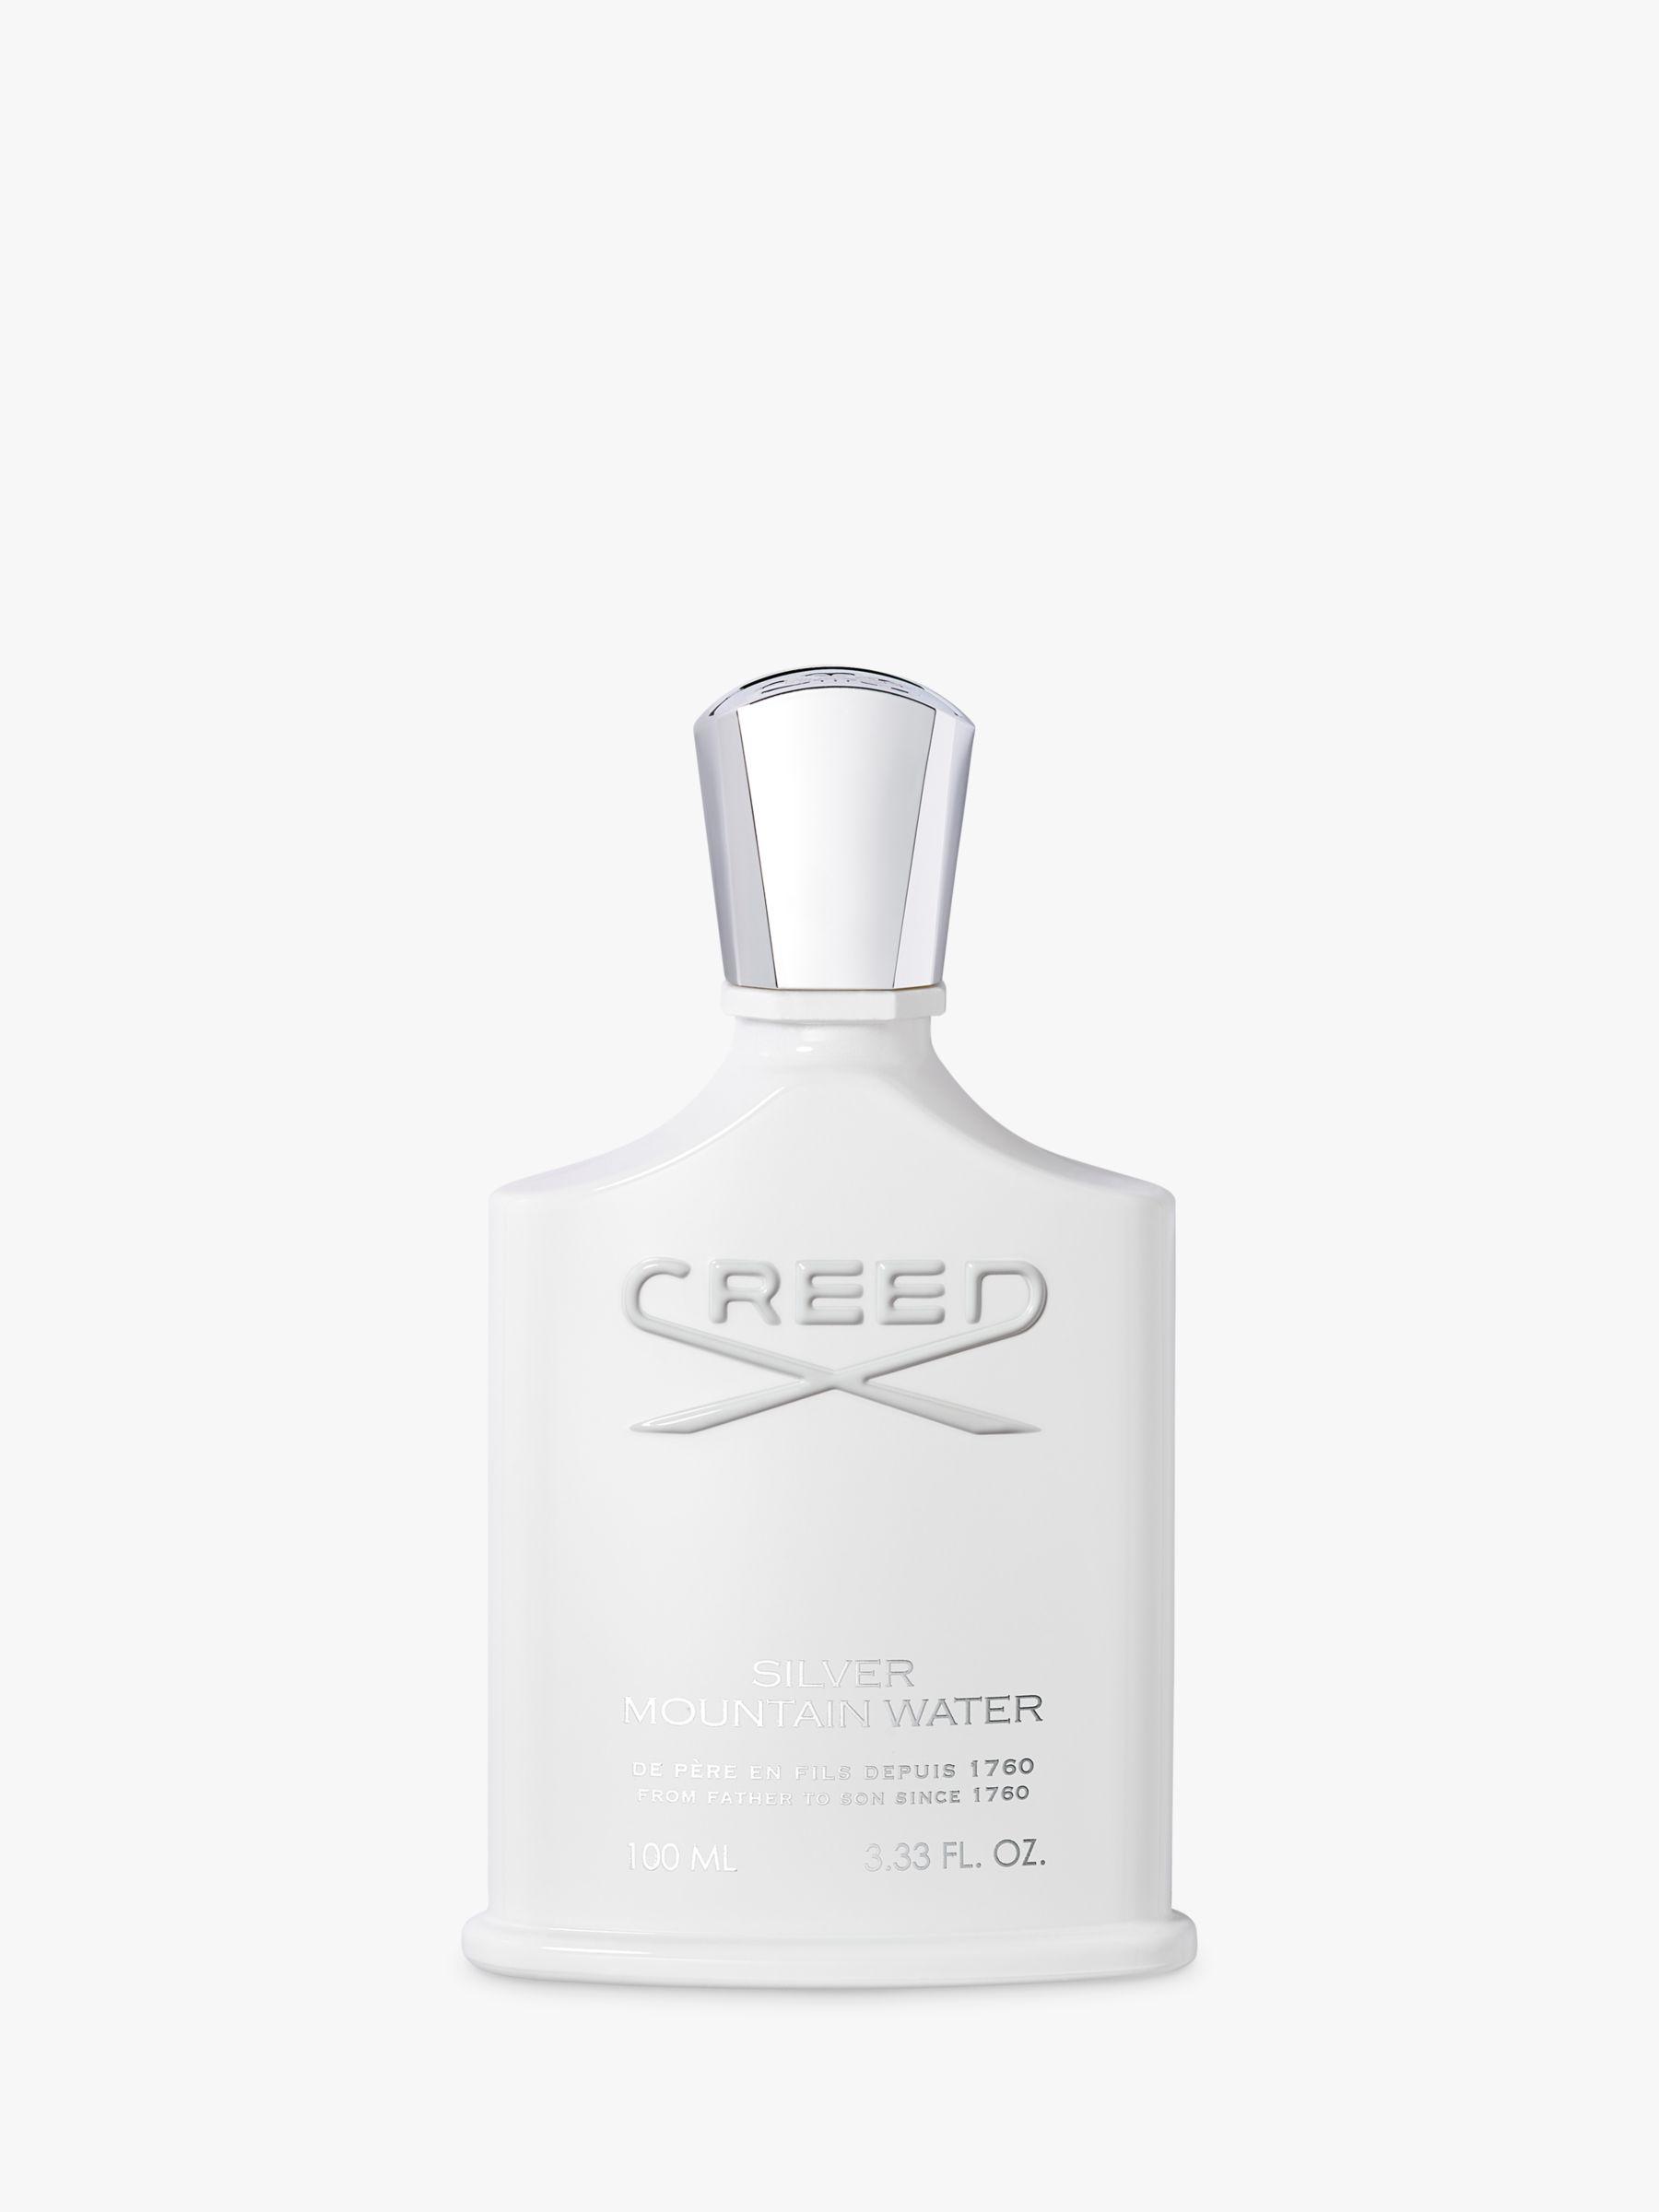 Creed CREED Silver Mountain Water Eau de Parfum, 100ml